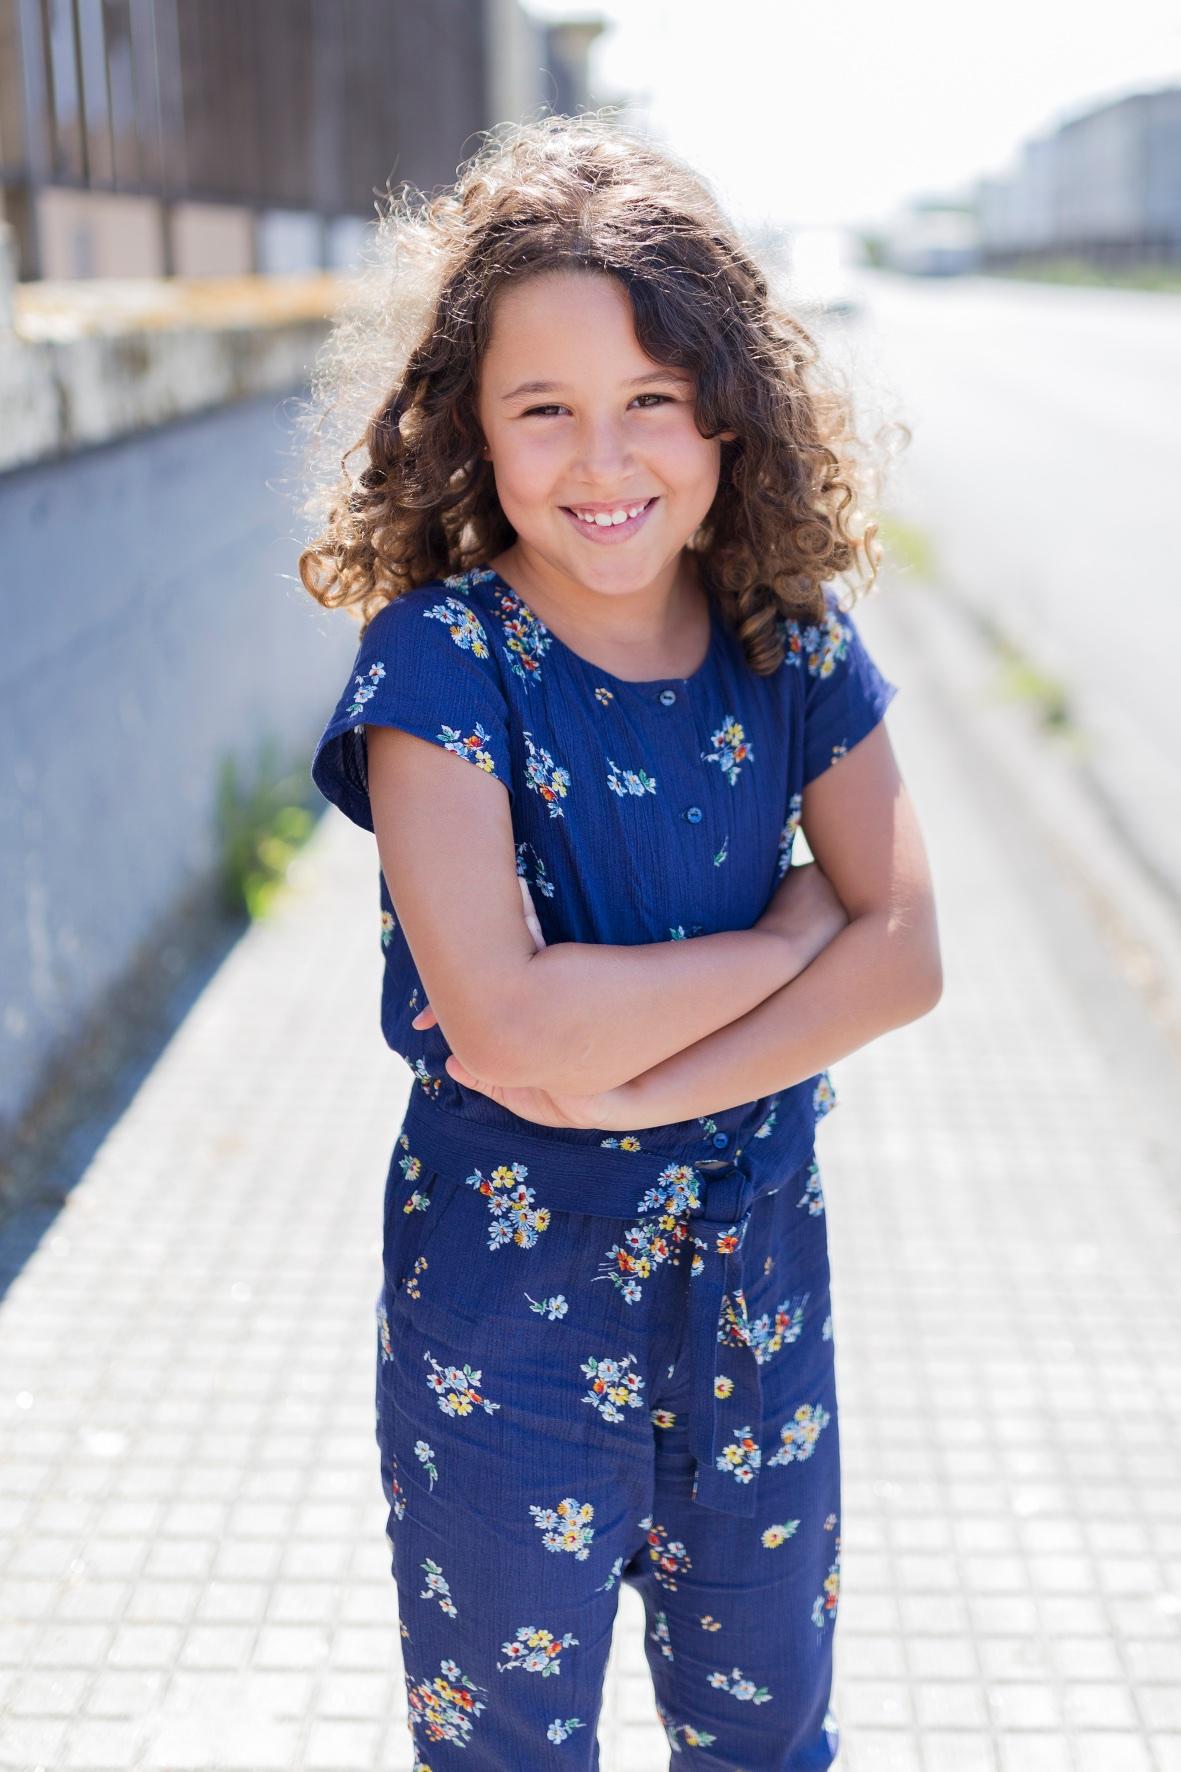 miniblogger-descalzaporelparque -coruña -jimena - jimena look- jumpsuit -kids -miniblogger - moda infantil -mono -niños- Soft -soft de ZARA KIDS - streestyle- style -zara-zara kids